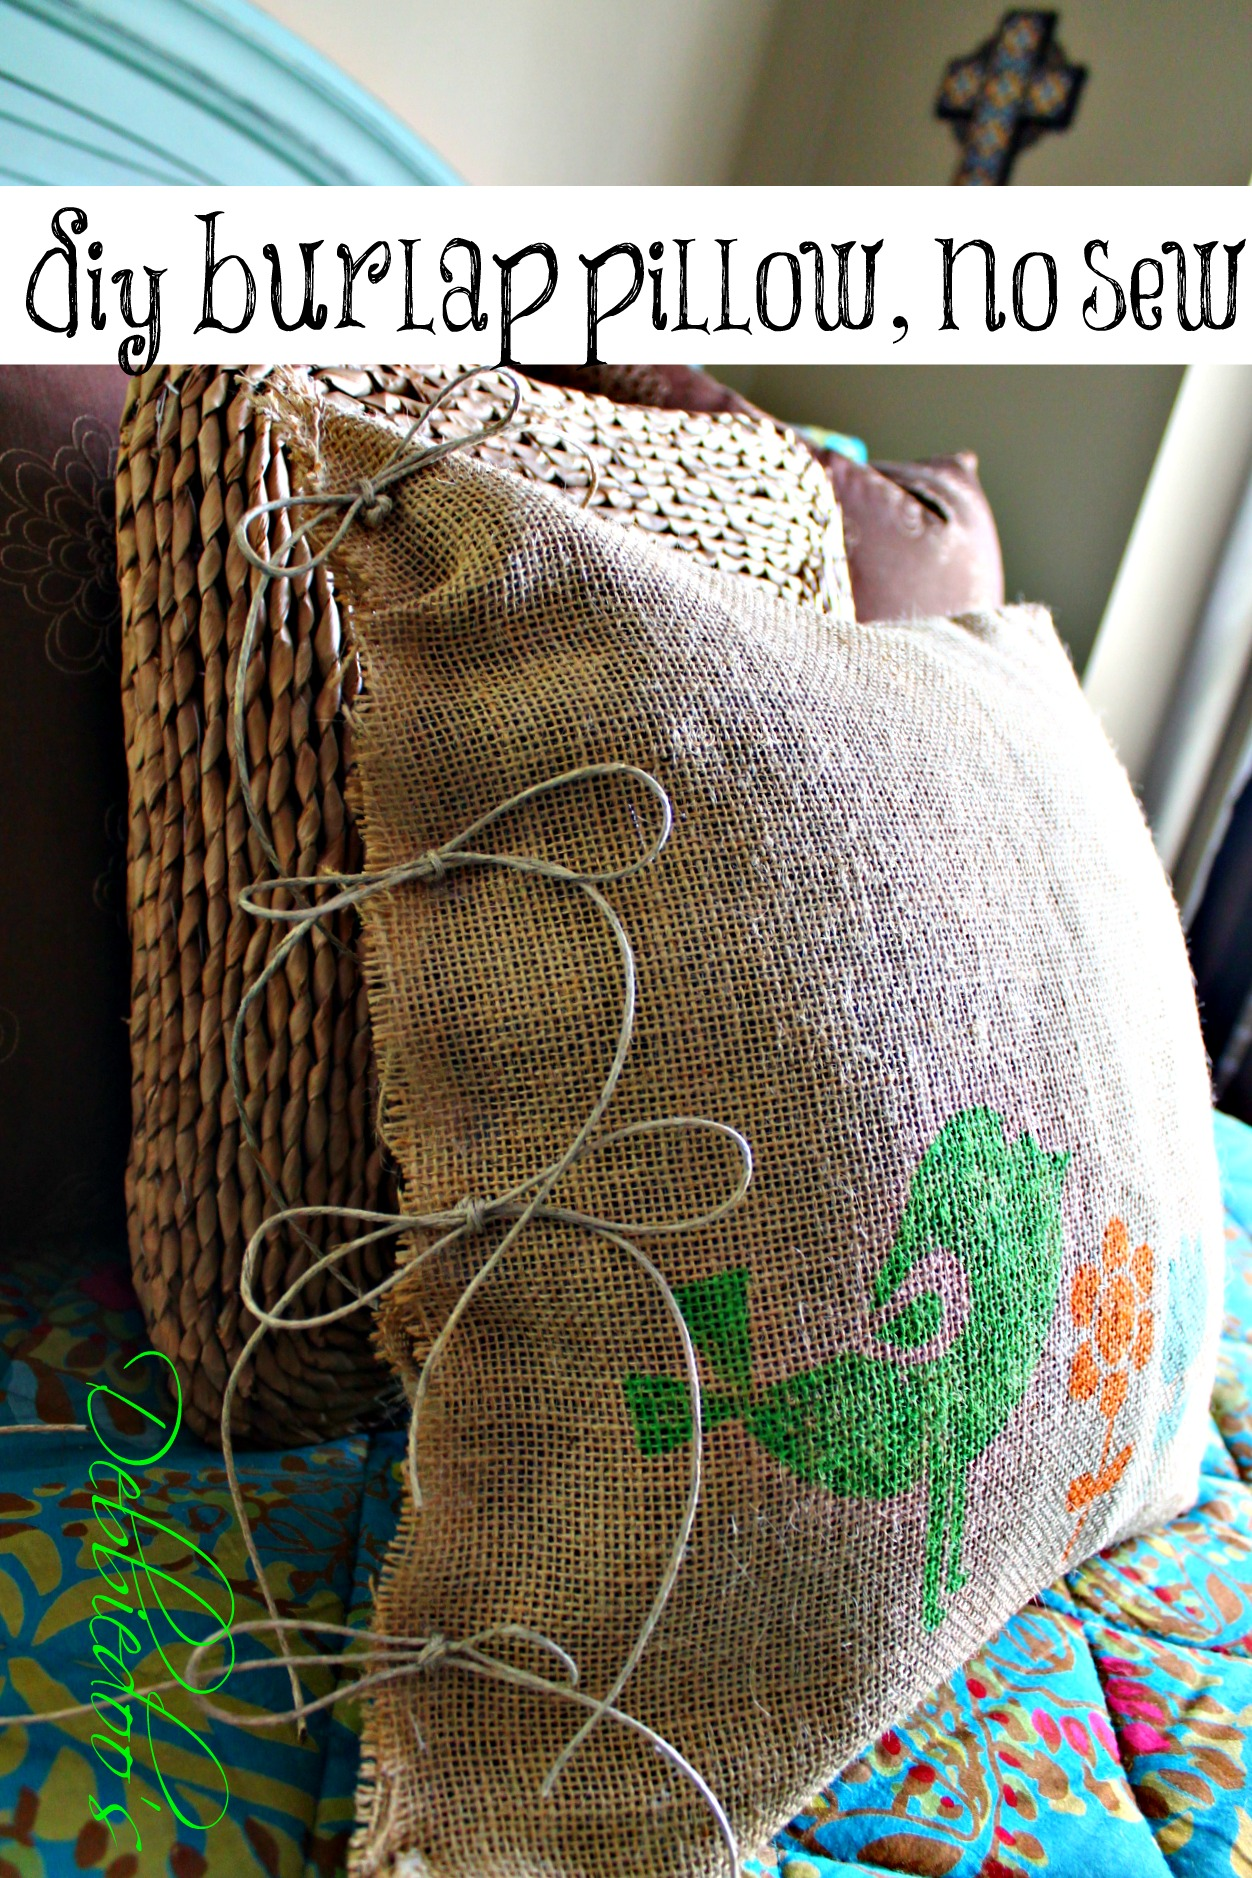 co image products clothing state potato burlap nevada pillow adbb